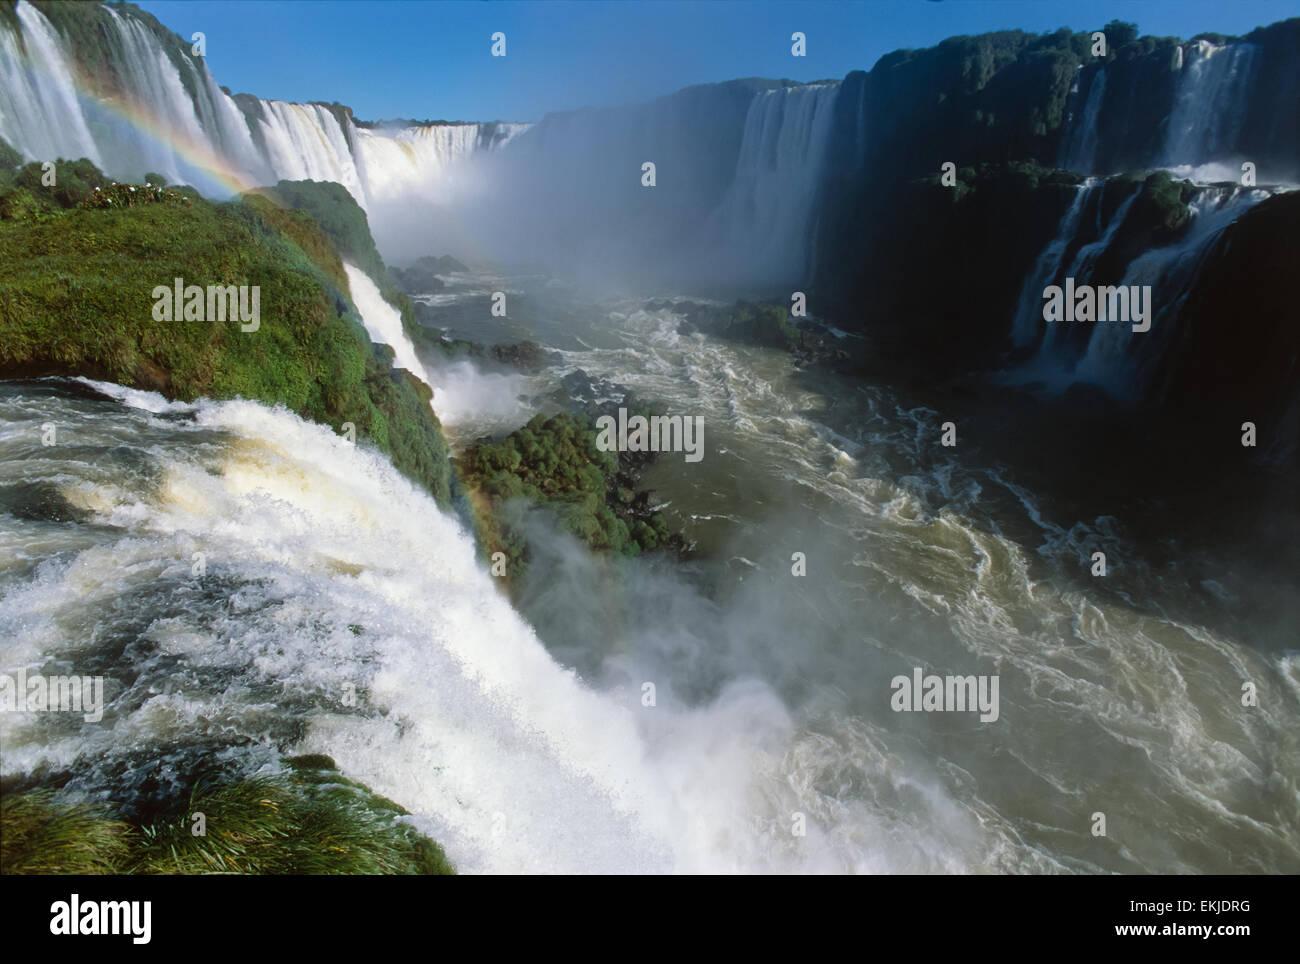 Garganta del Diablo (Devils Throat), with top of Salto Santa Maria, Iguassu Falls, (Cataratas del Iguazu, Argentina), - Stock Image